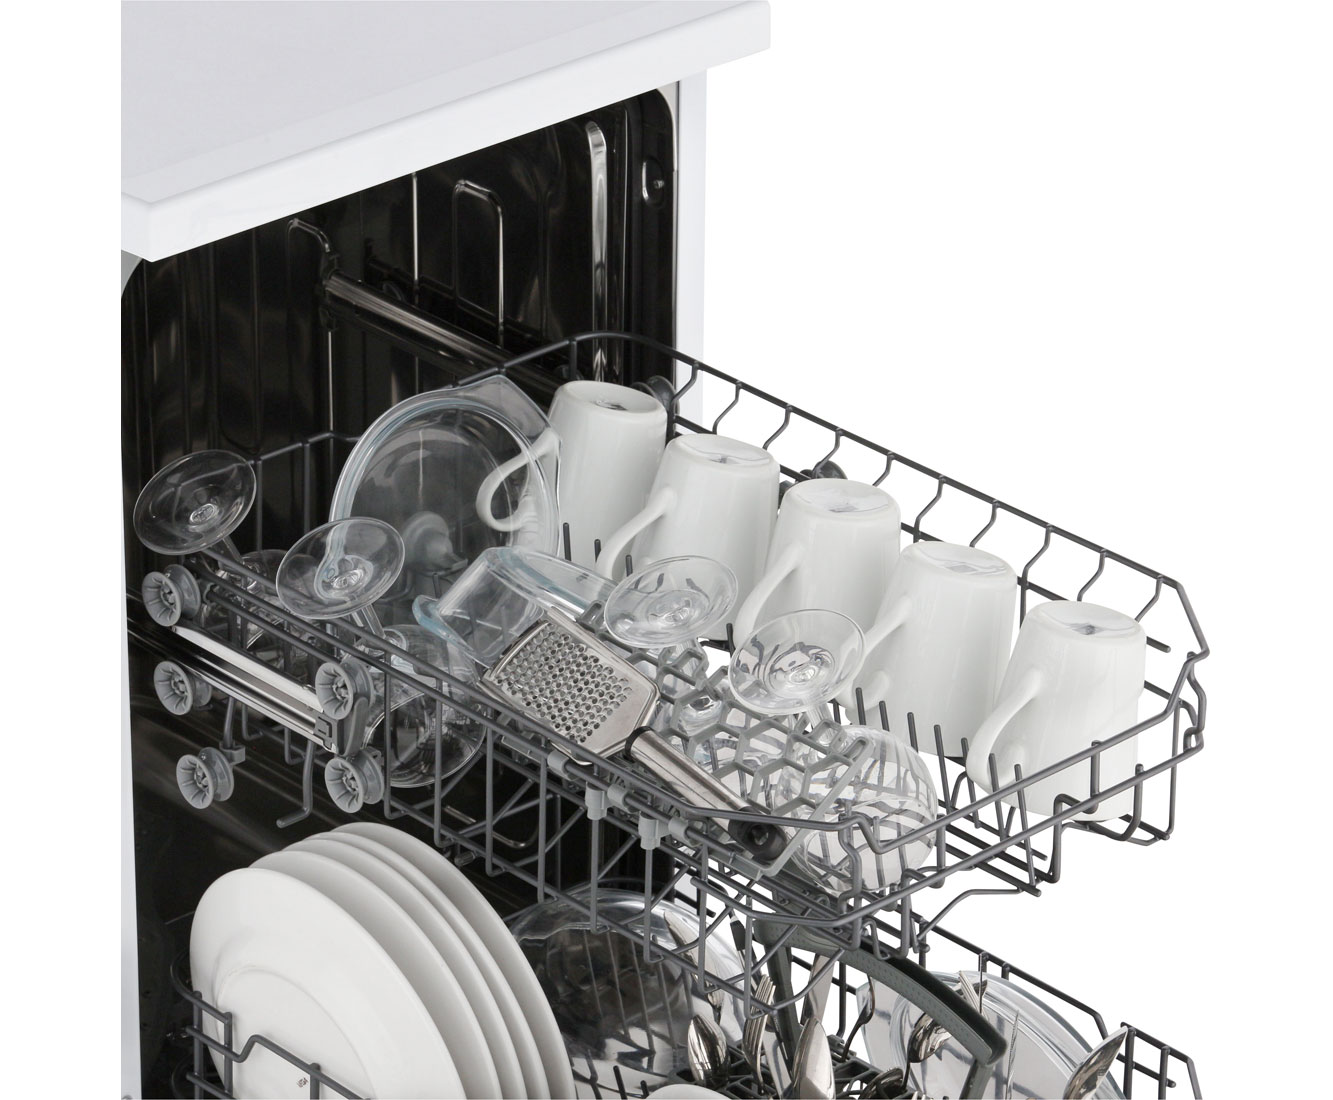 silber gorenje GS52010S Spülmaschine